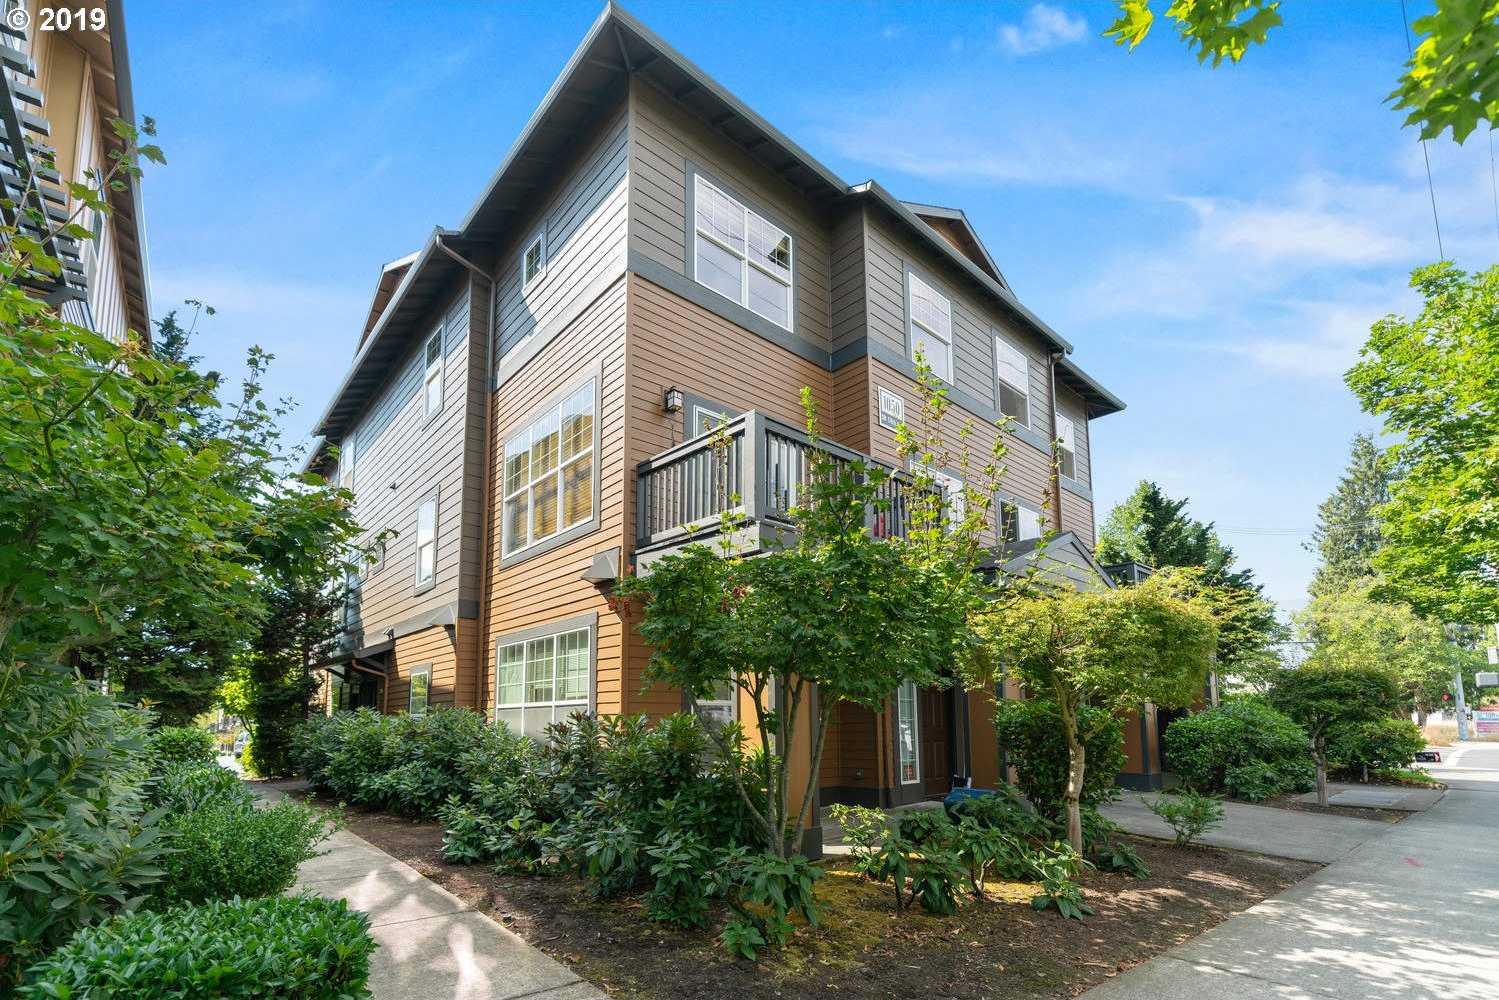 $289,900 - 3Br/3Ba -  for Sale in Beaverton